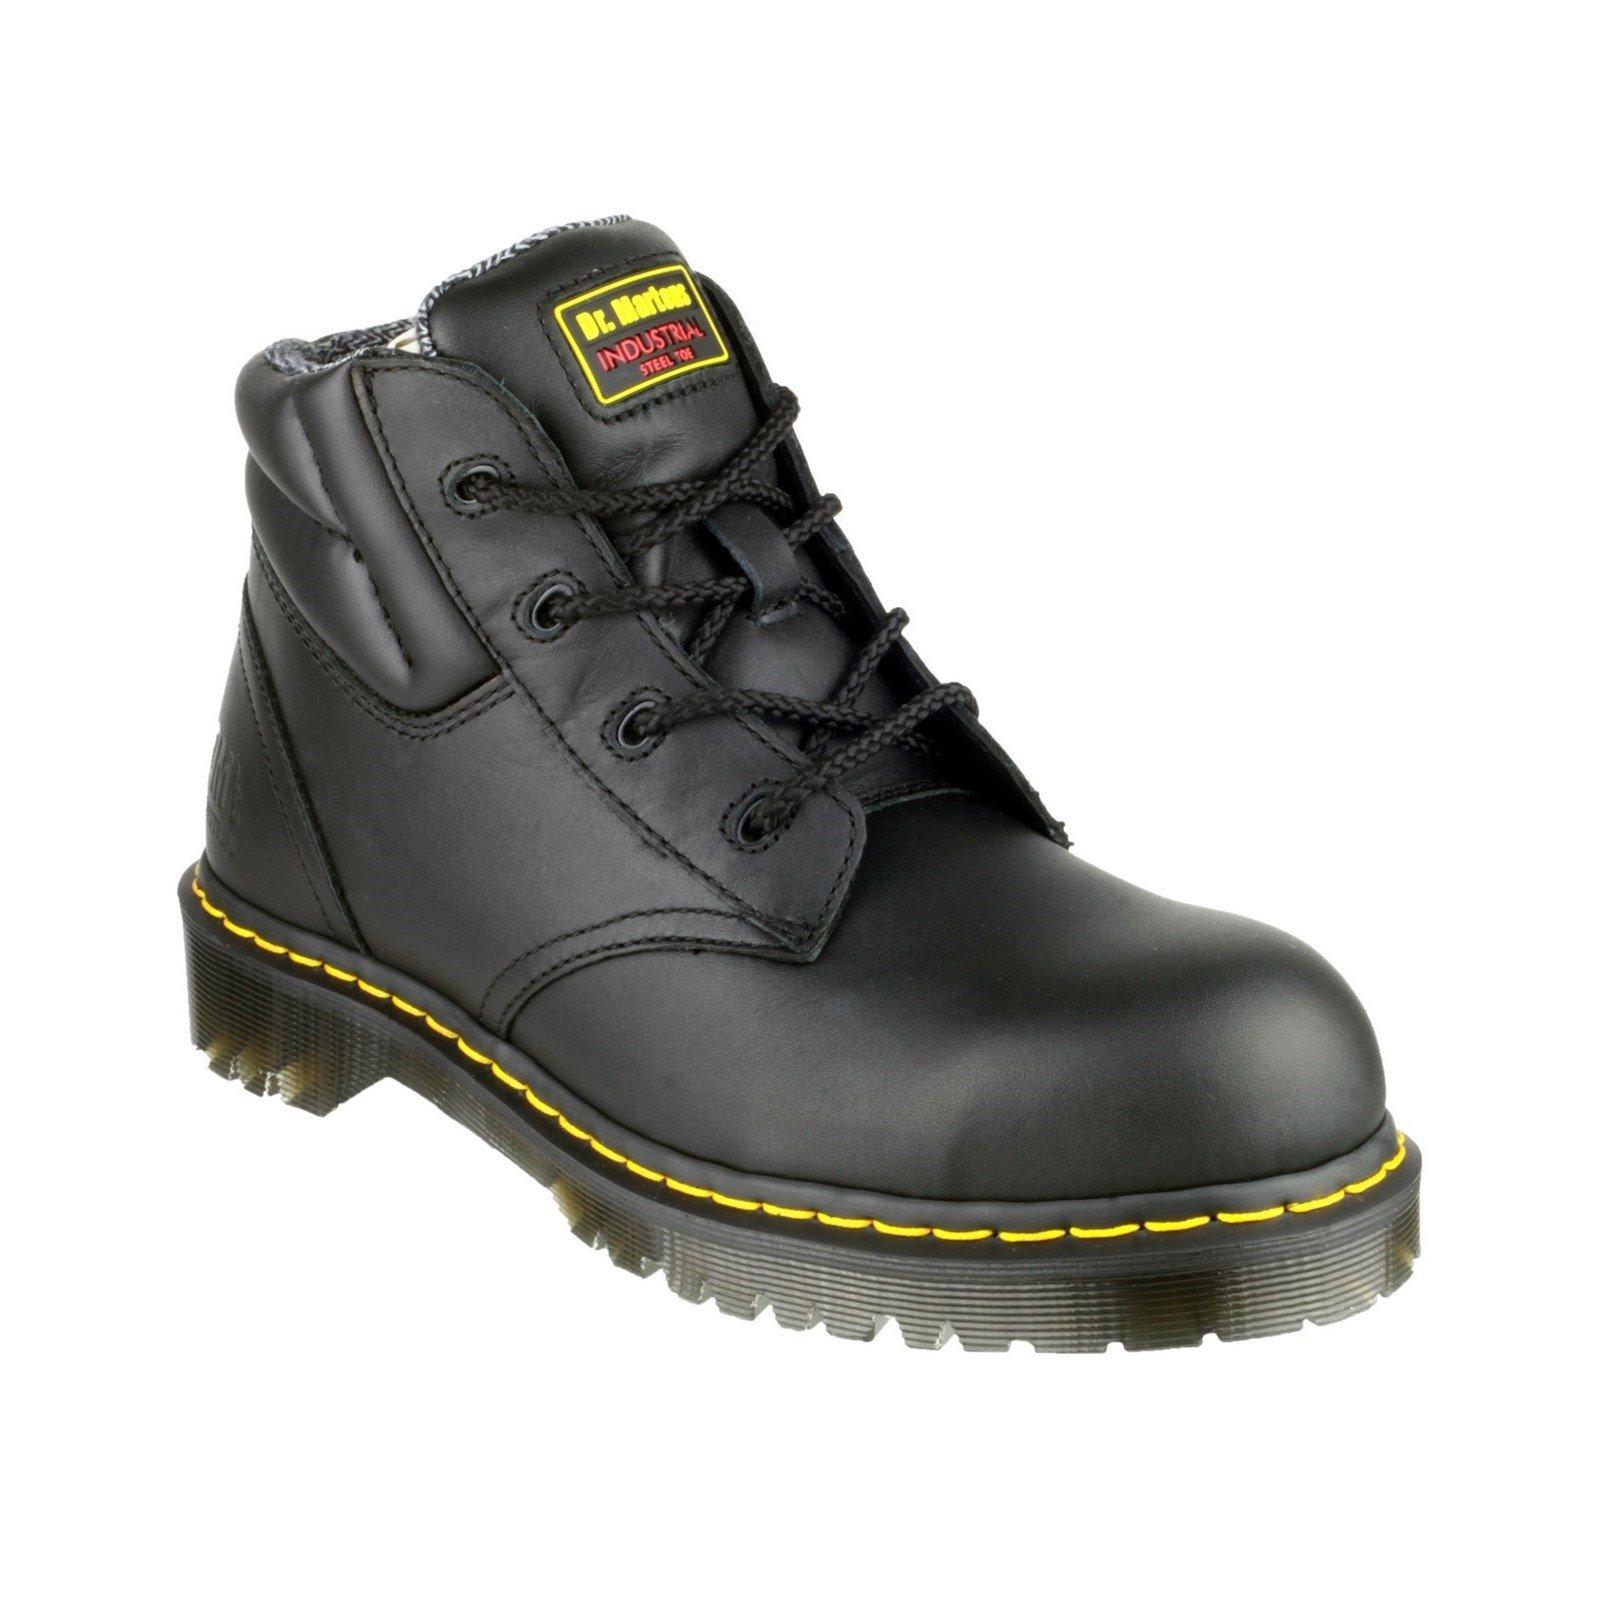 Dr Martens Unisex Lace-Up Boot Black 14068 - Black 13